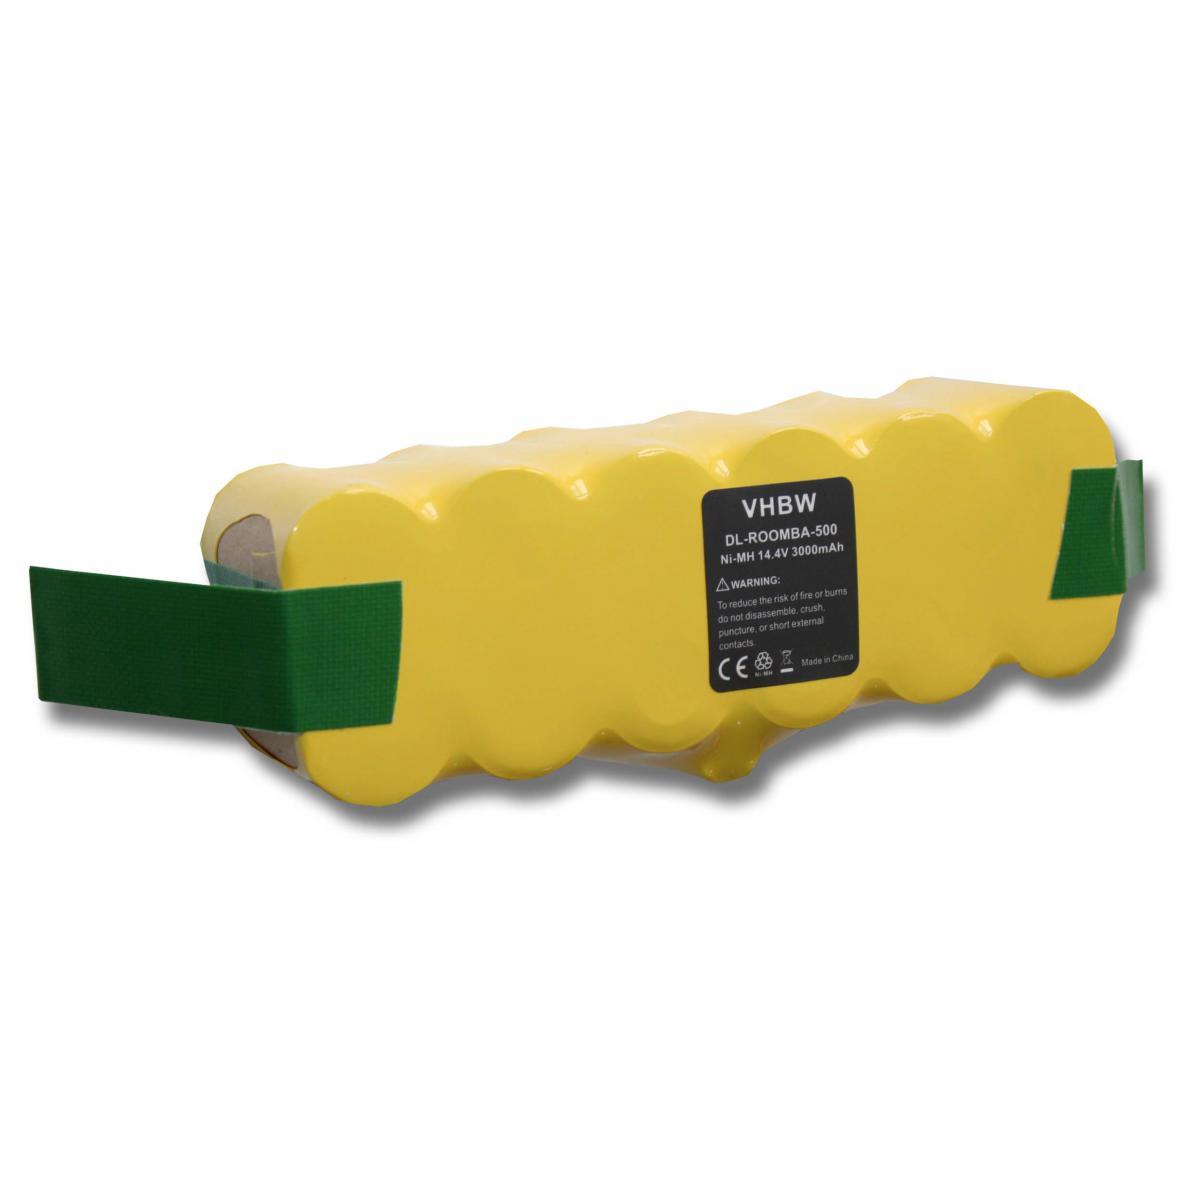 Vhbw vhbw batterie Ni-MH 3000mAh (14.4V) compatible avec iRobot Roomba 700, 785, 790 aspirateur remplace 11702, GD-Roomba-500